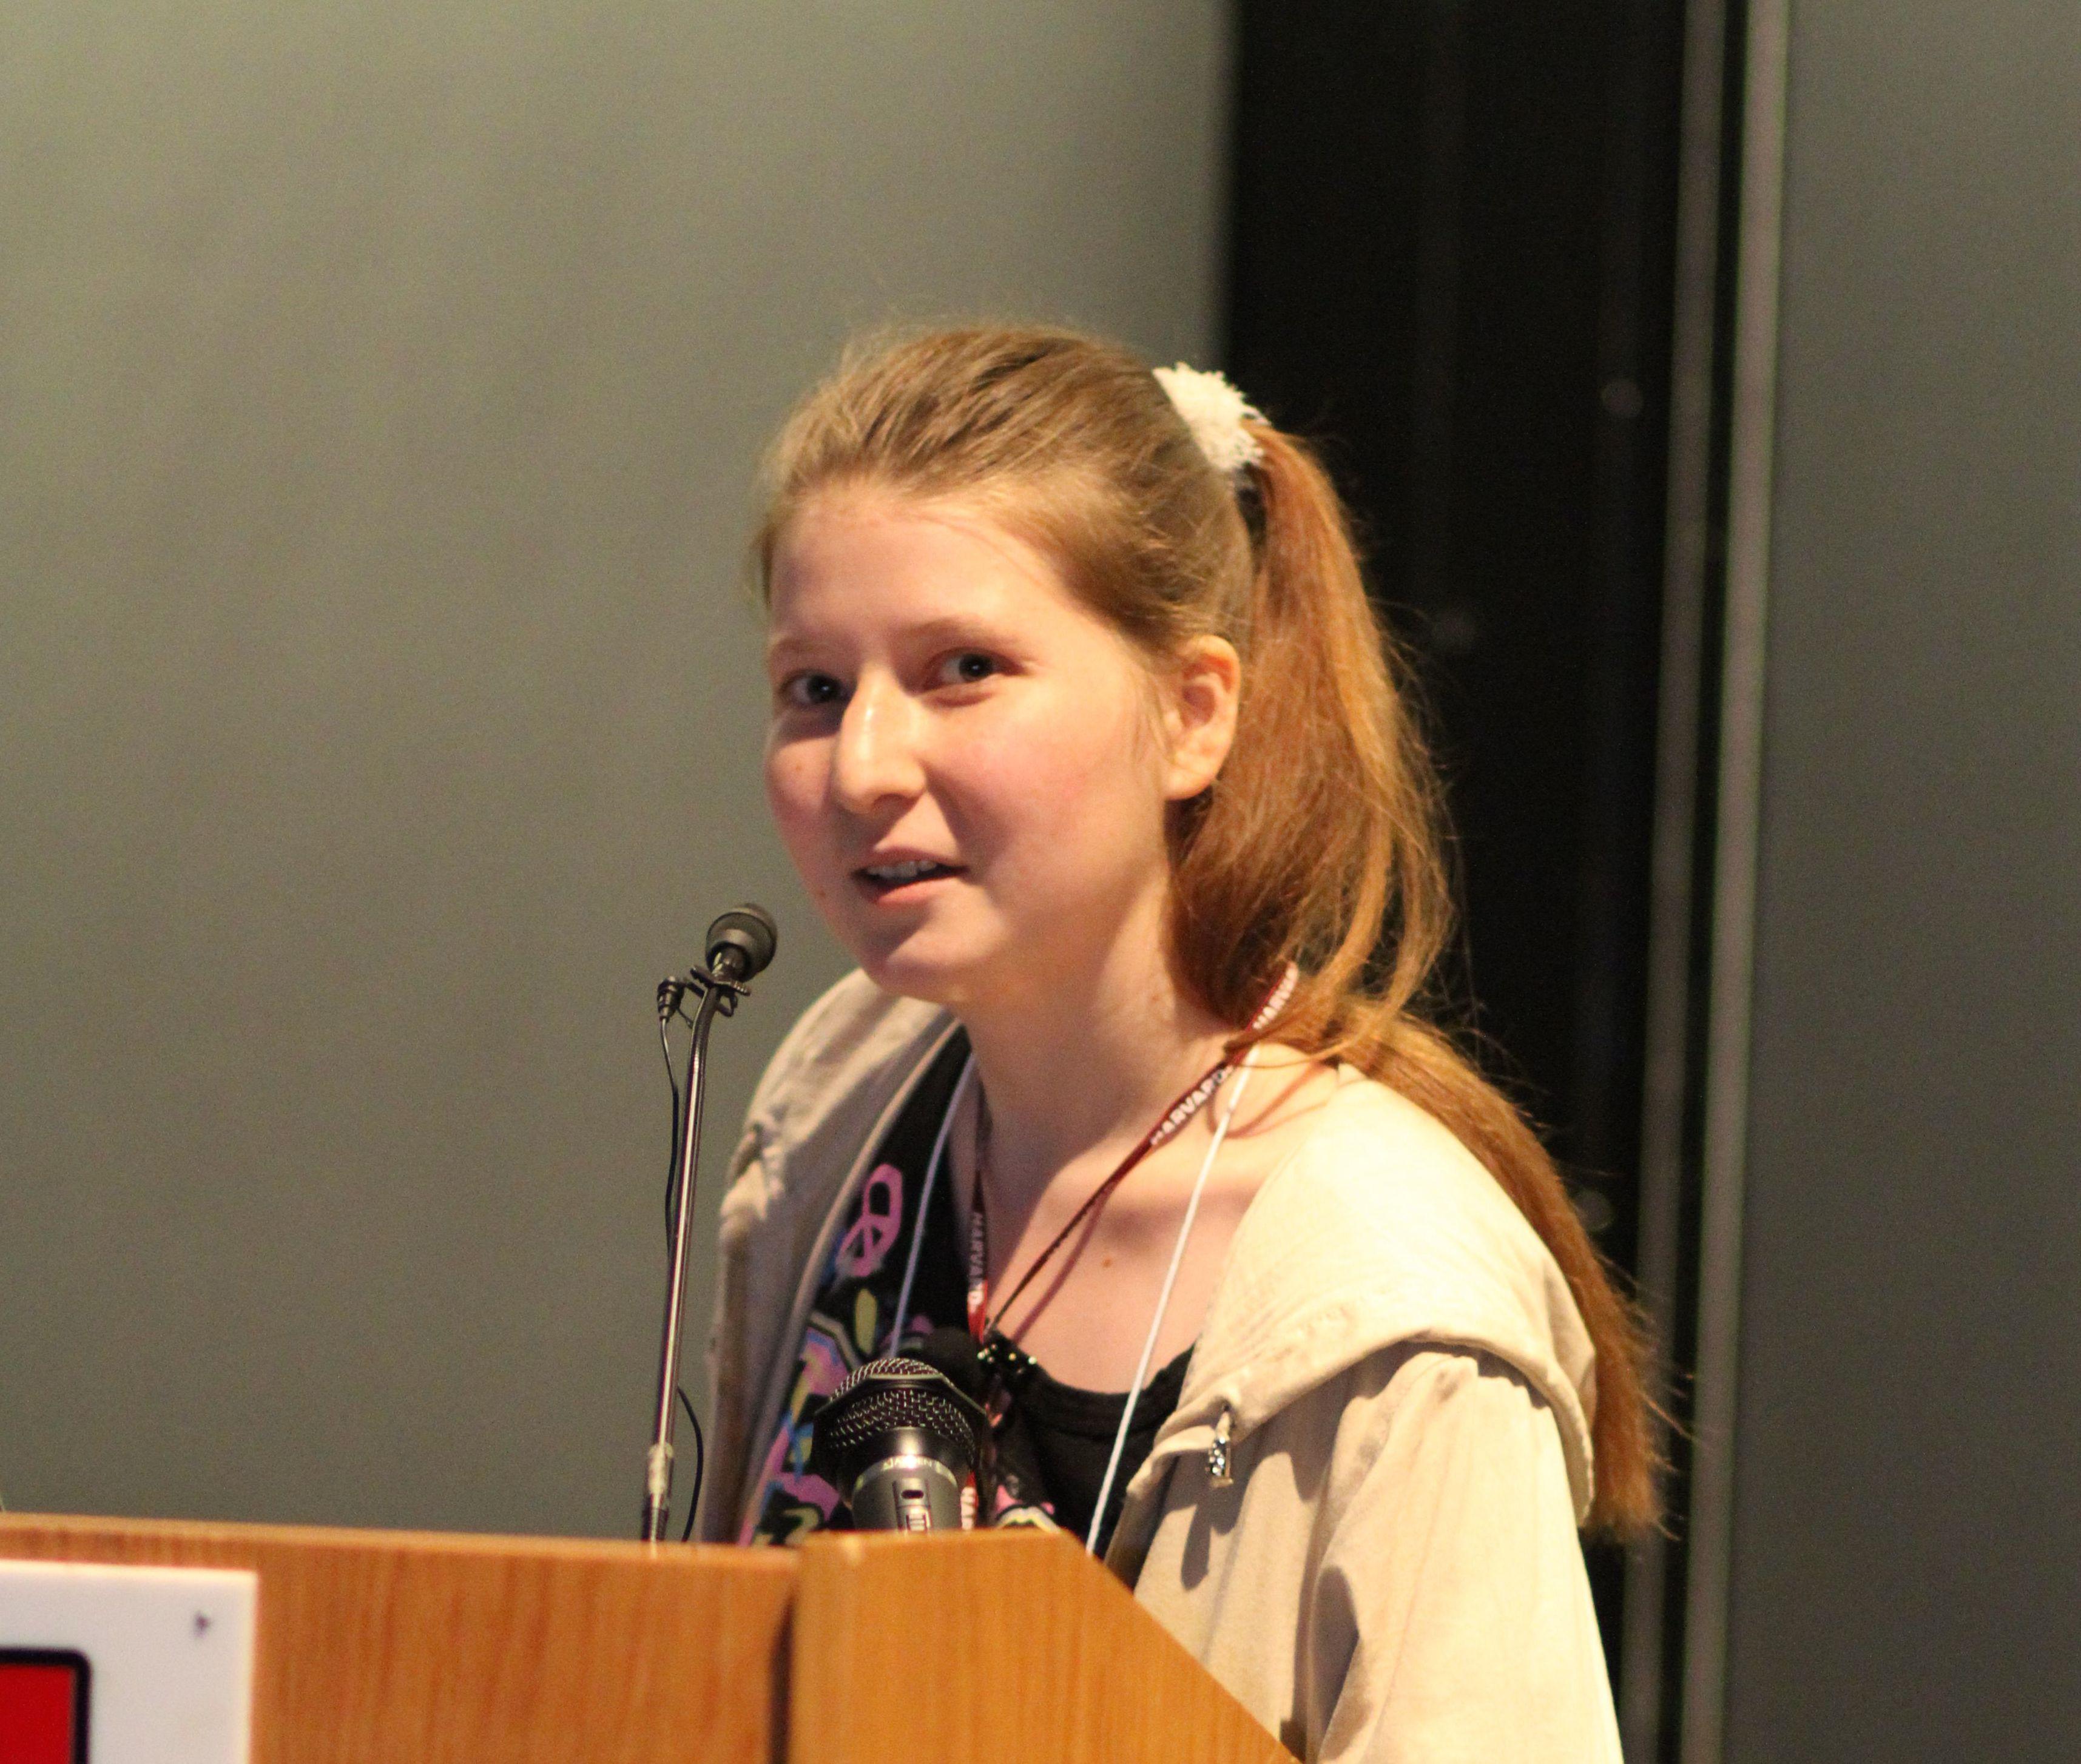 Alexandra Elbakyan, academic pirate